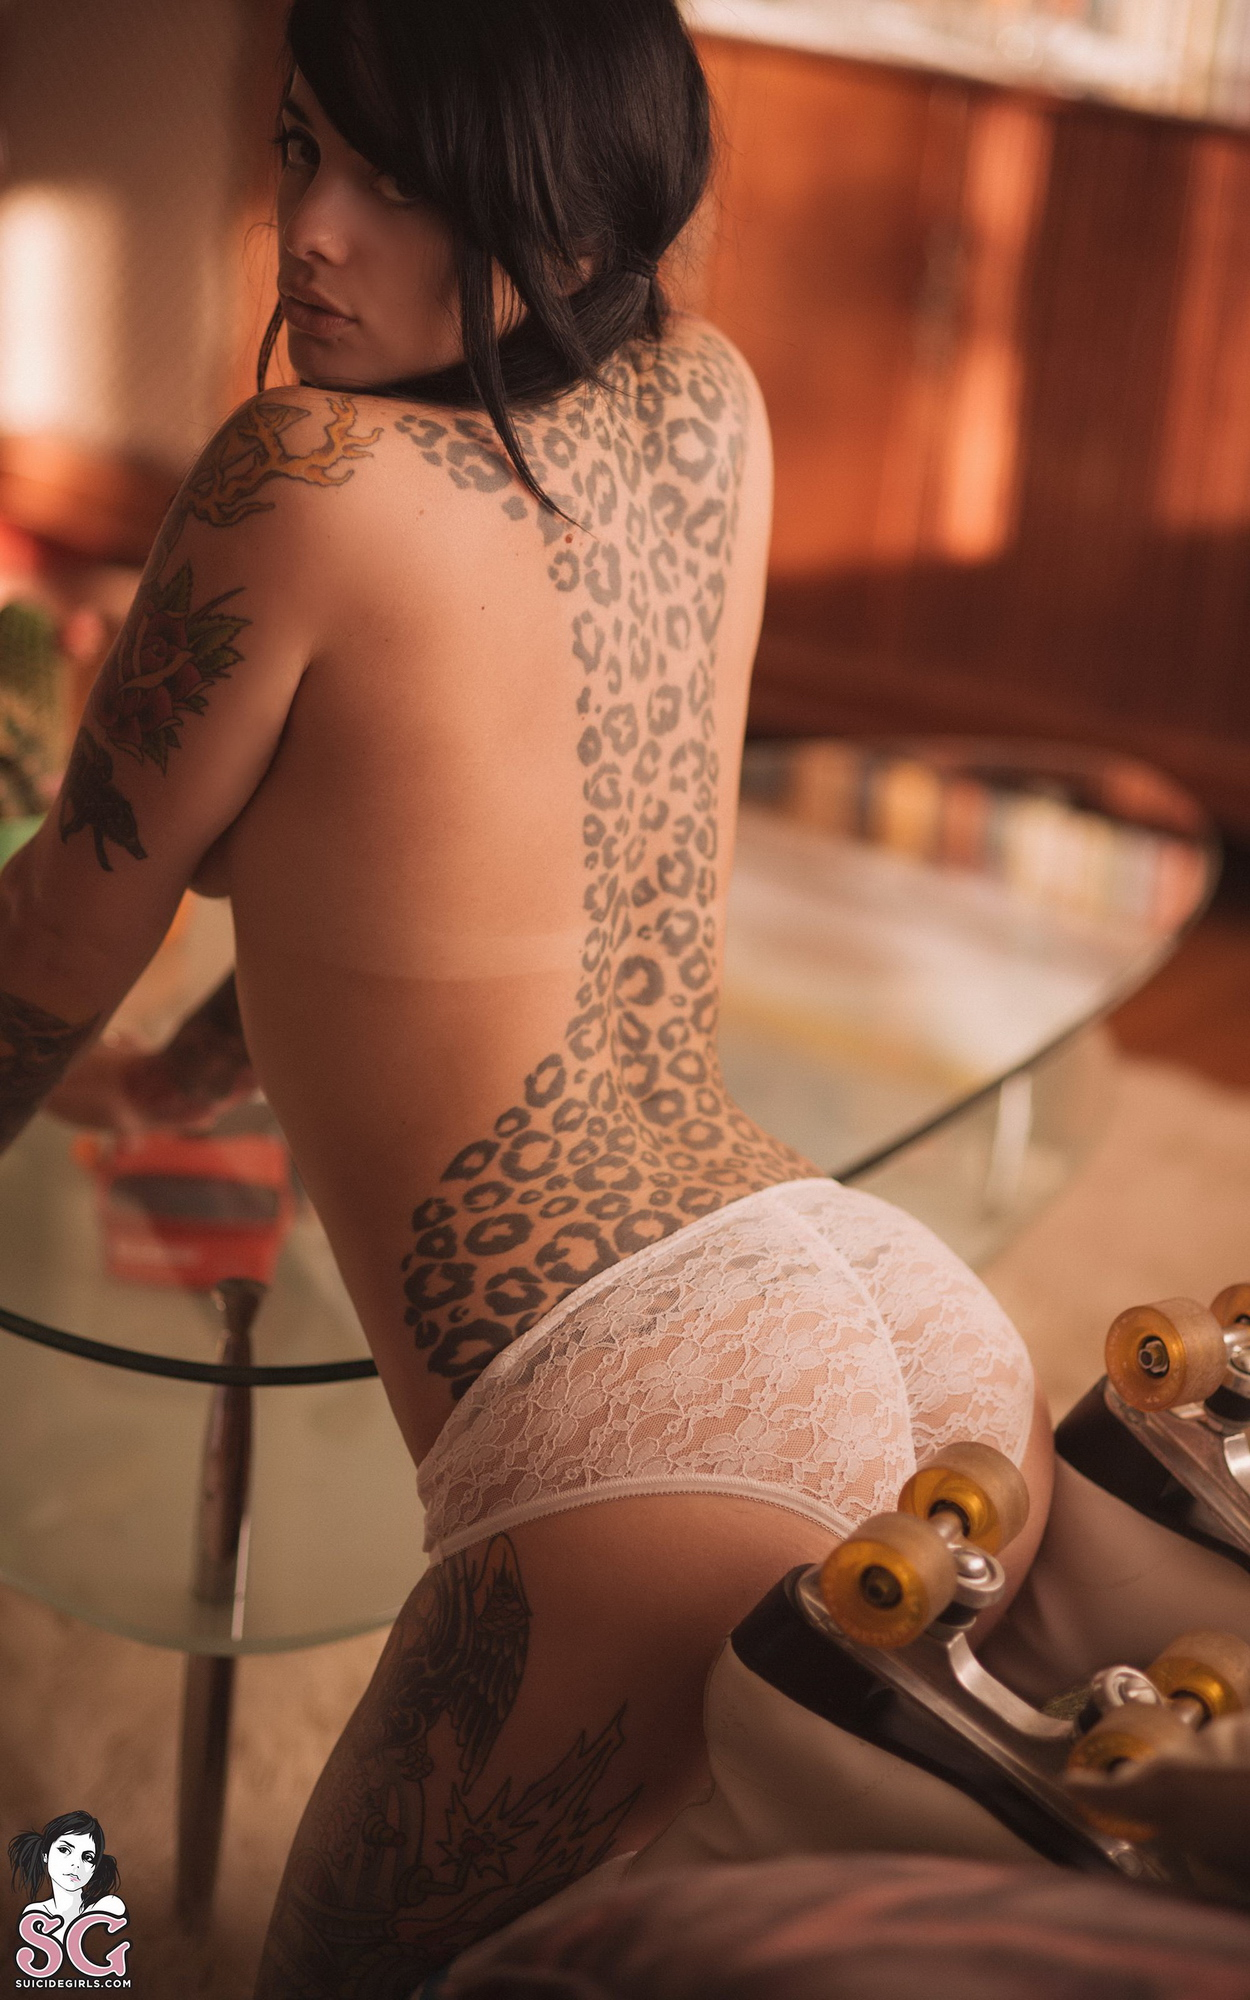 radeo-nude-brunette-roller-skates-tattoo-suicide-girls-14